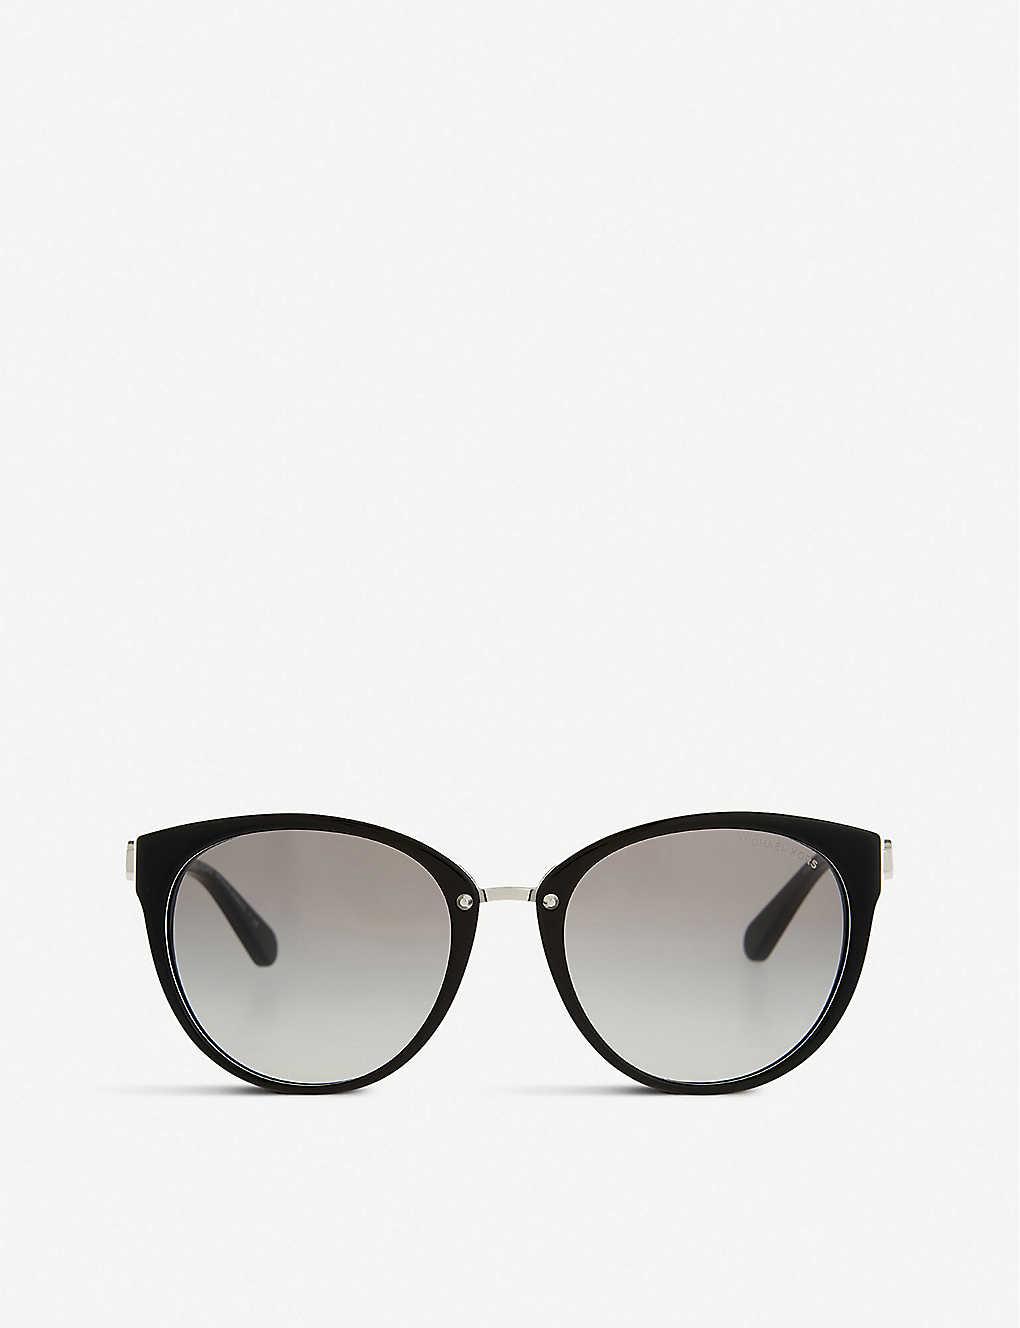 23108502757e MICHAEL KORS - Mk6039 Abela III cat eye-frame sunglasses ...